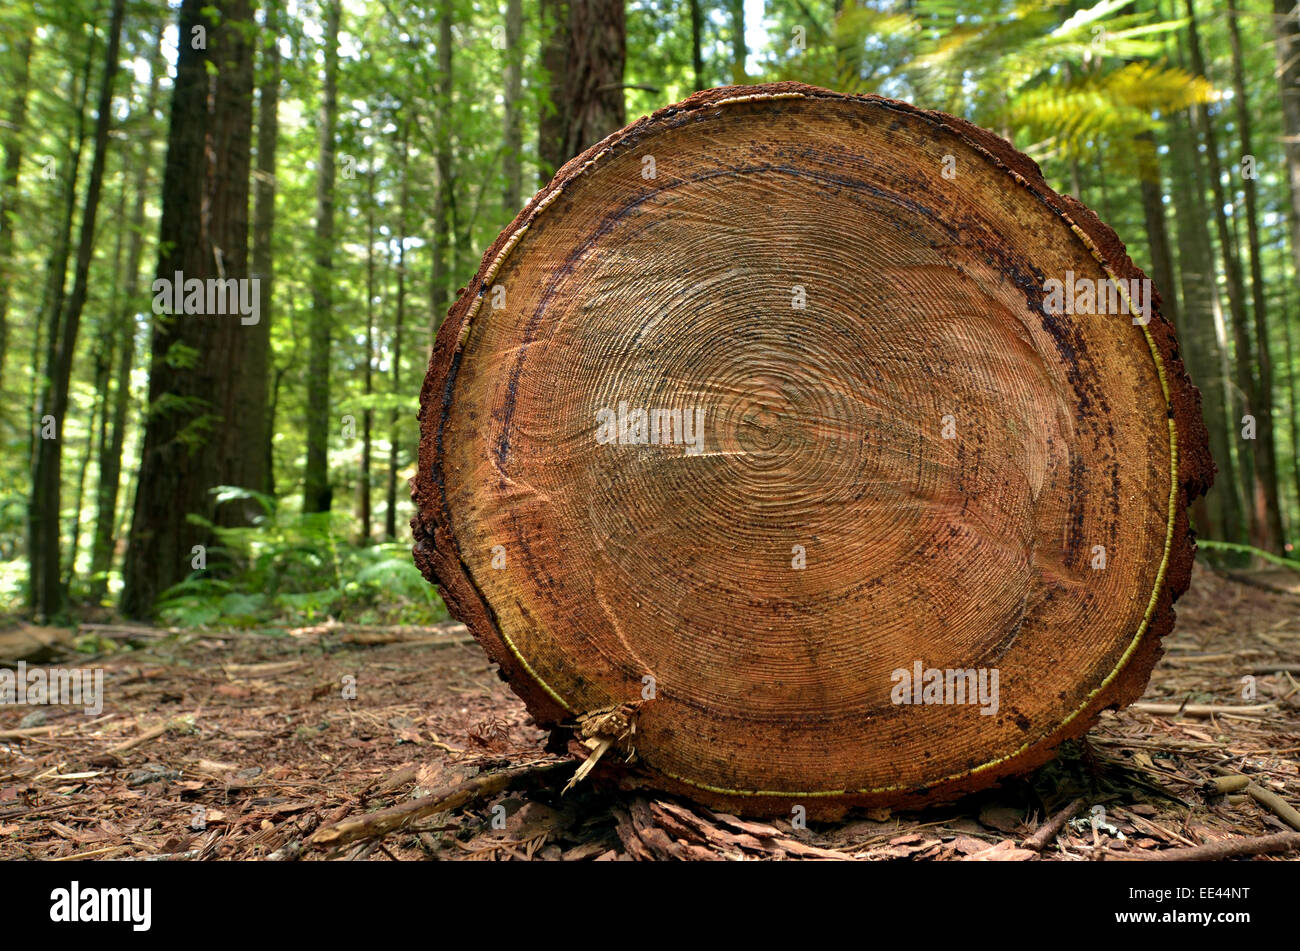 Chopped tree log lies on the ground in Redwoods – Whakarewarewa Forest in Rotorua, New Zealand. - Stock Image